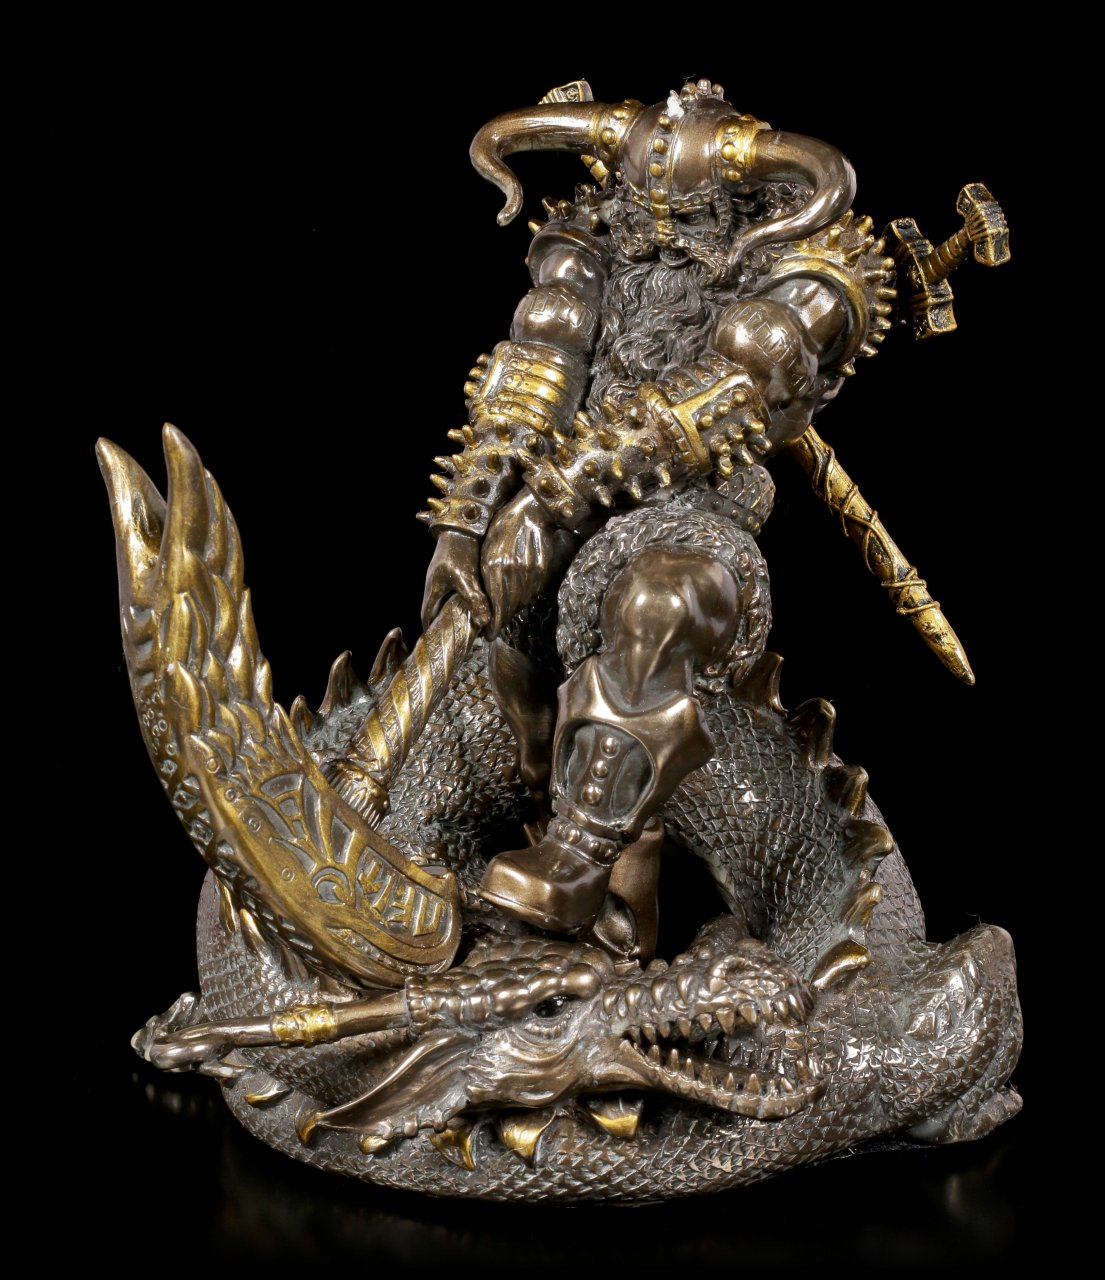 Thor Figur - Kampf mit Midgardschlange Jormungand